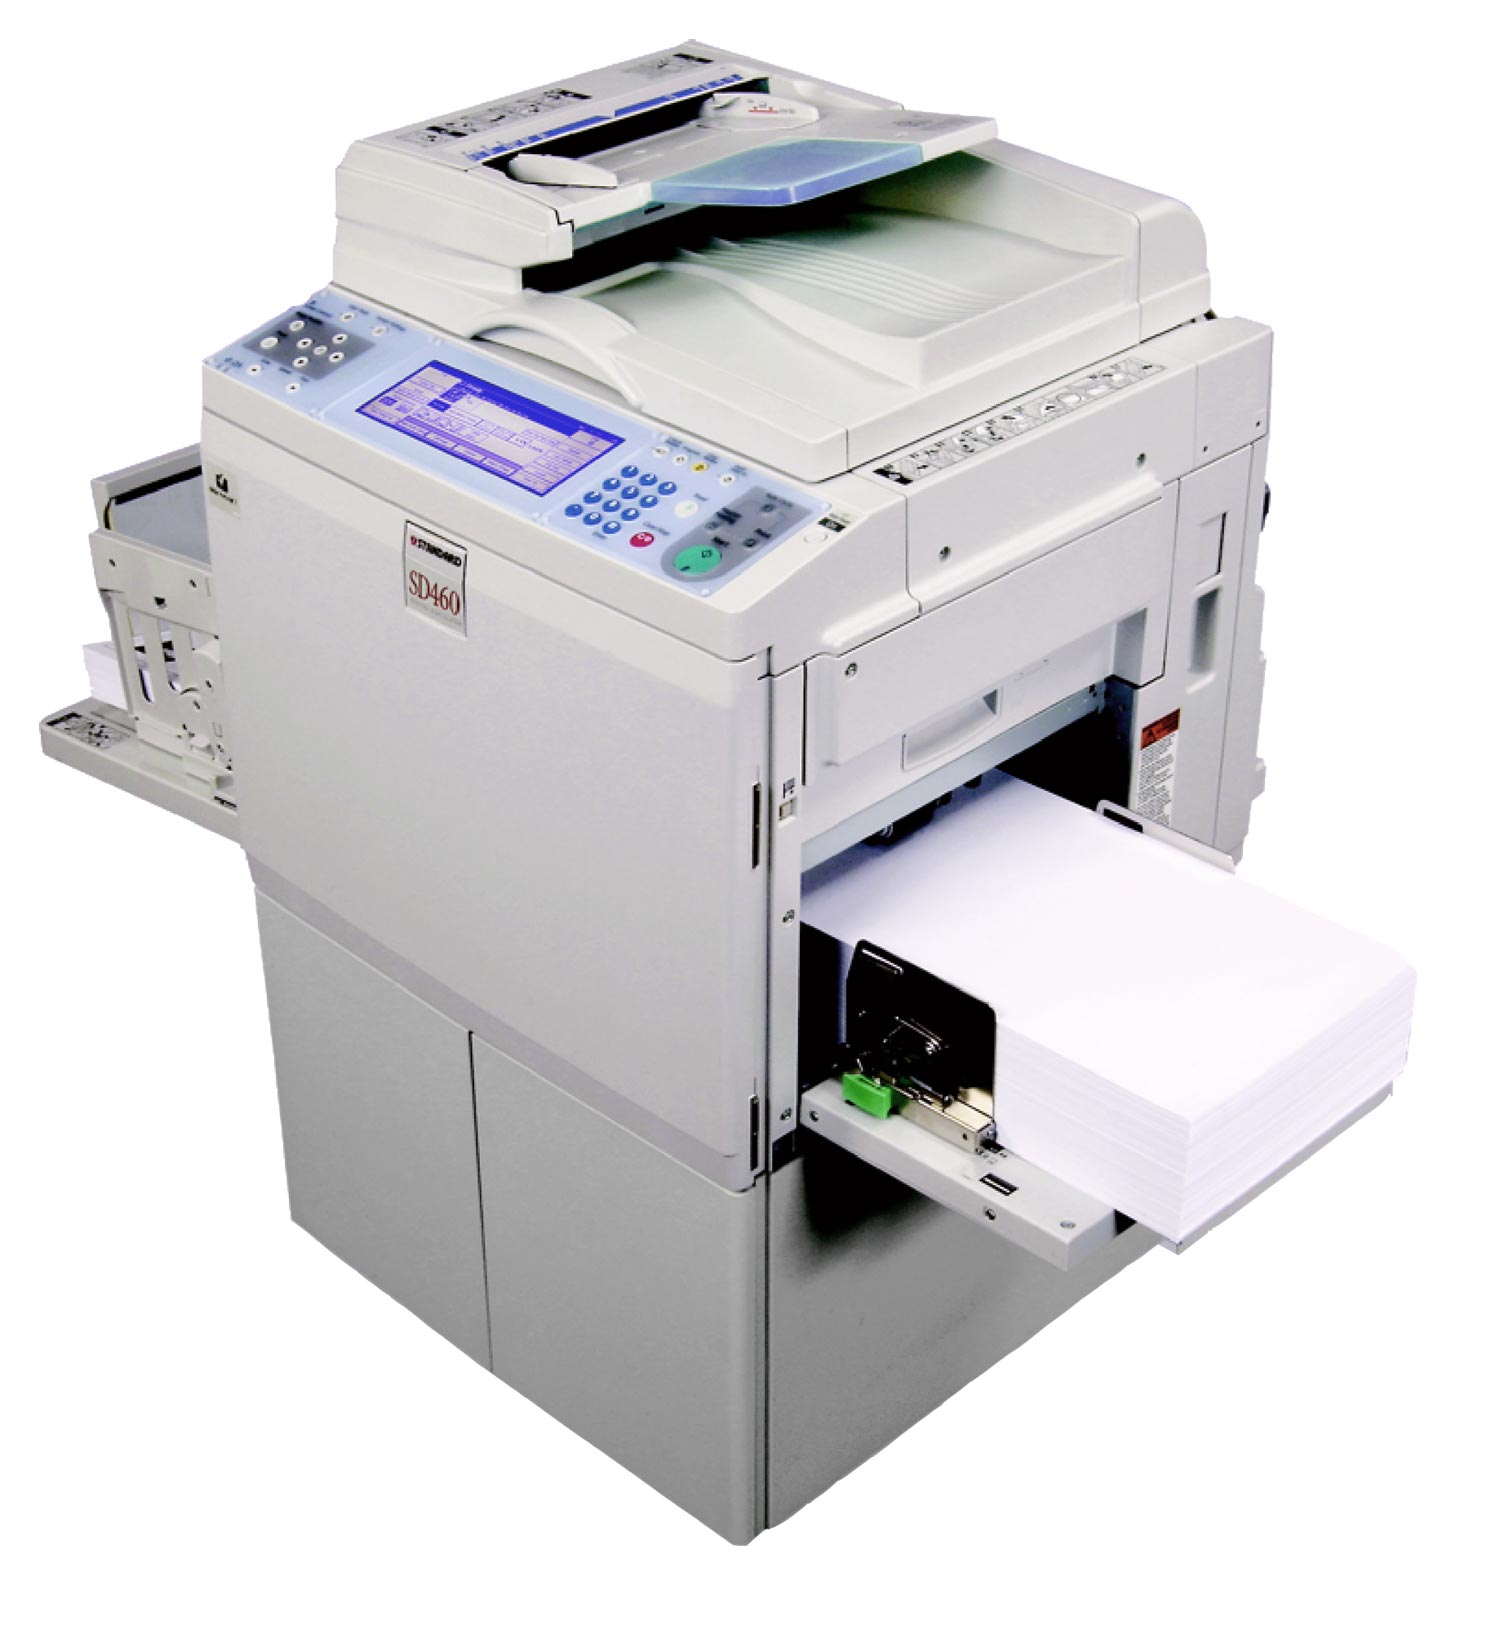 SD460 Duplicator